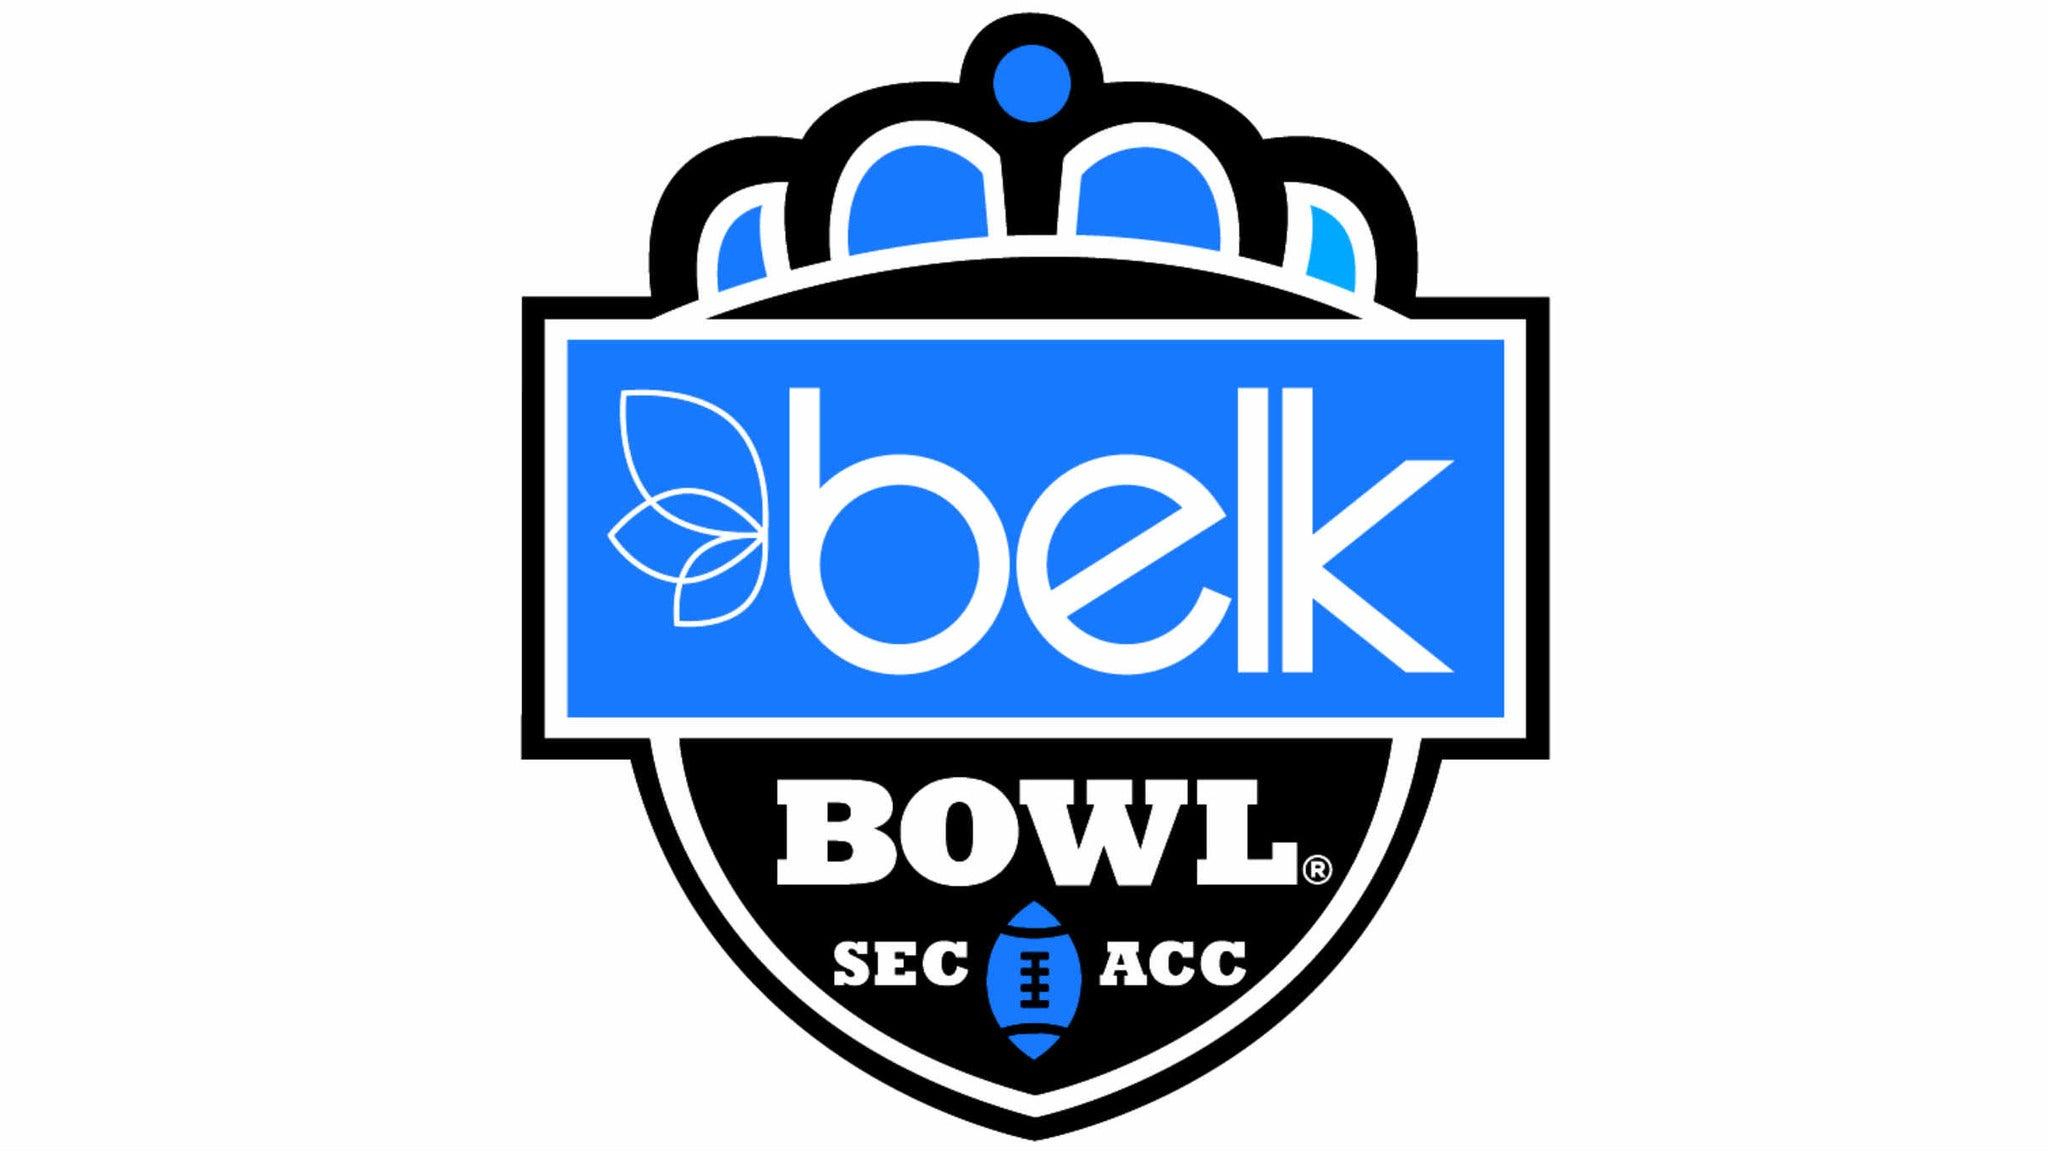 Belk Bowl at Bank of America Stadium